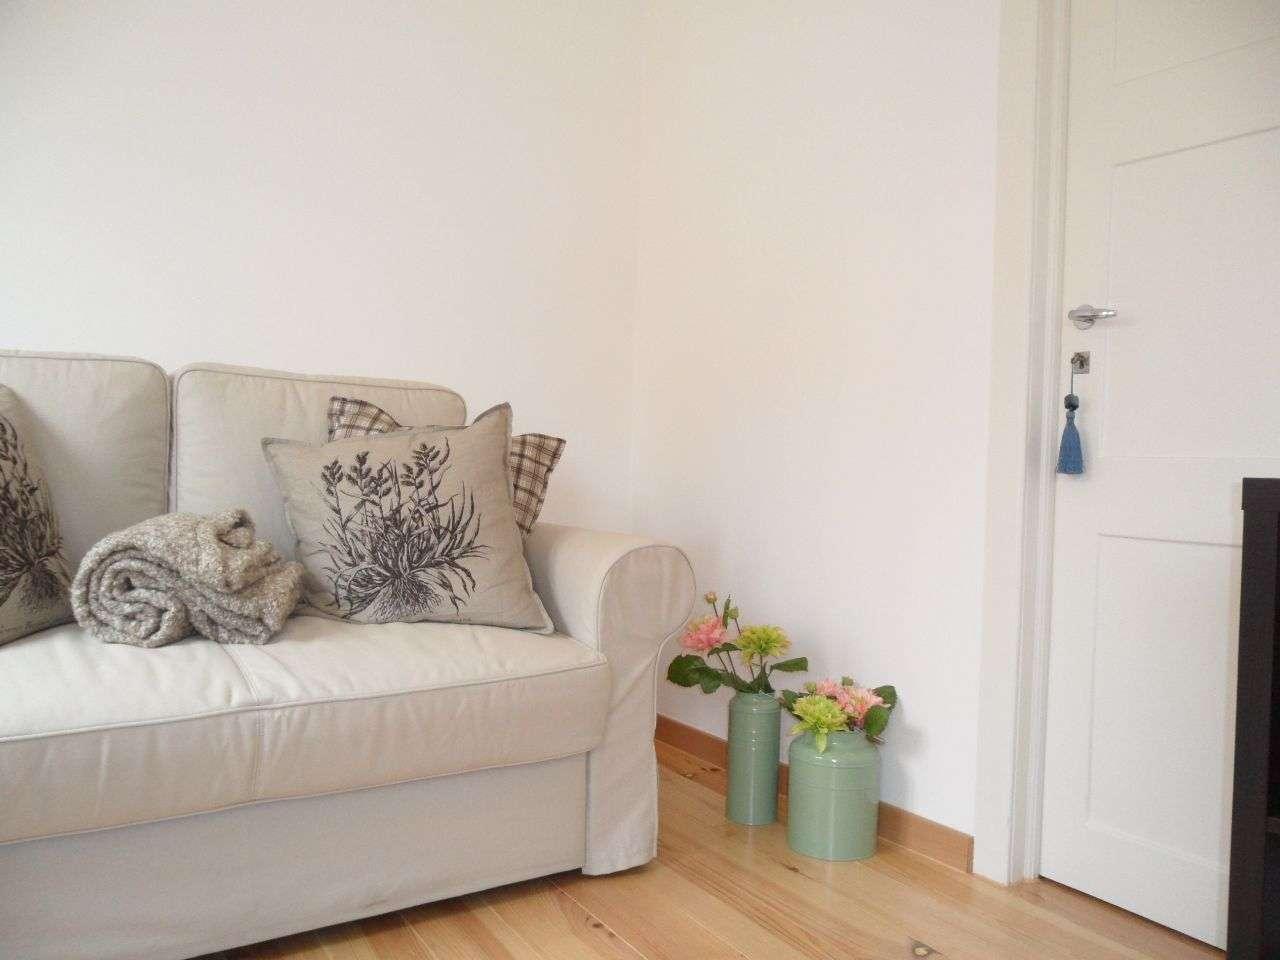 Apartamento para arrendar, Santa Maria Maior, Lisboa - Foto 6